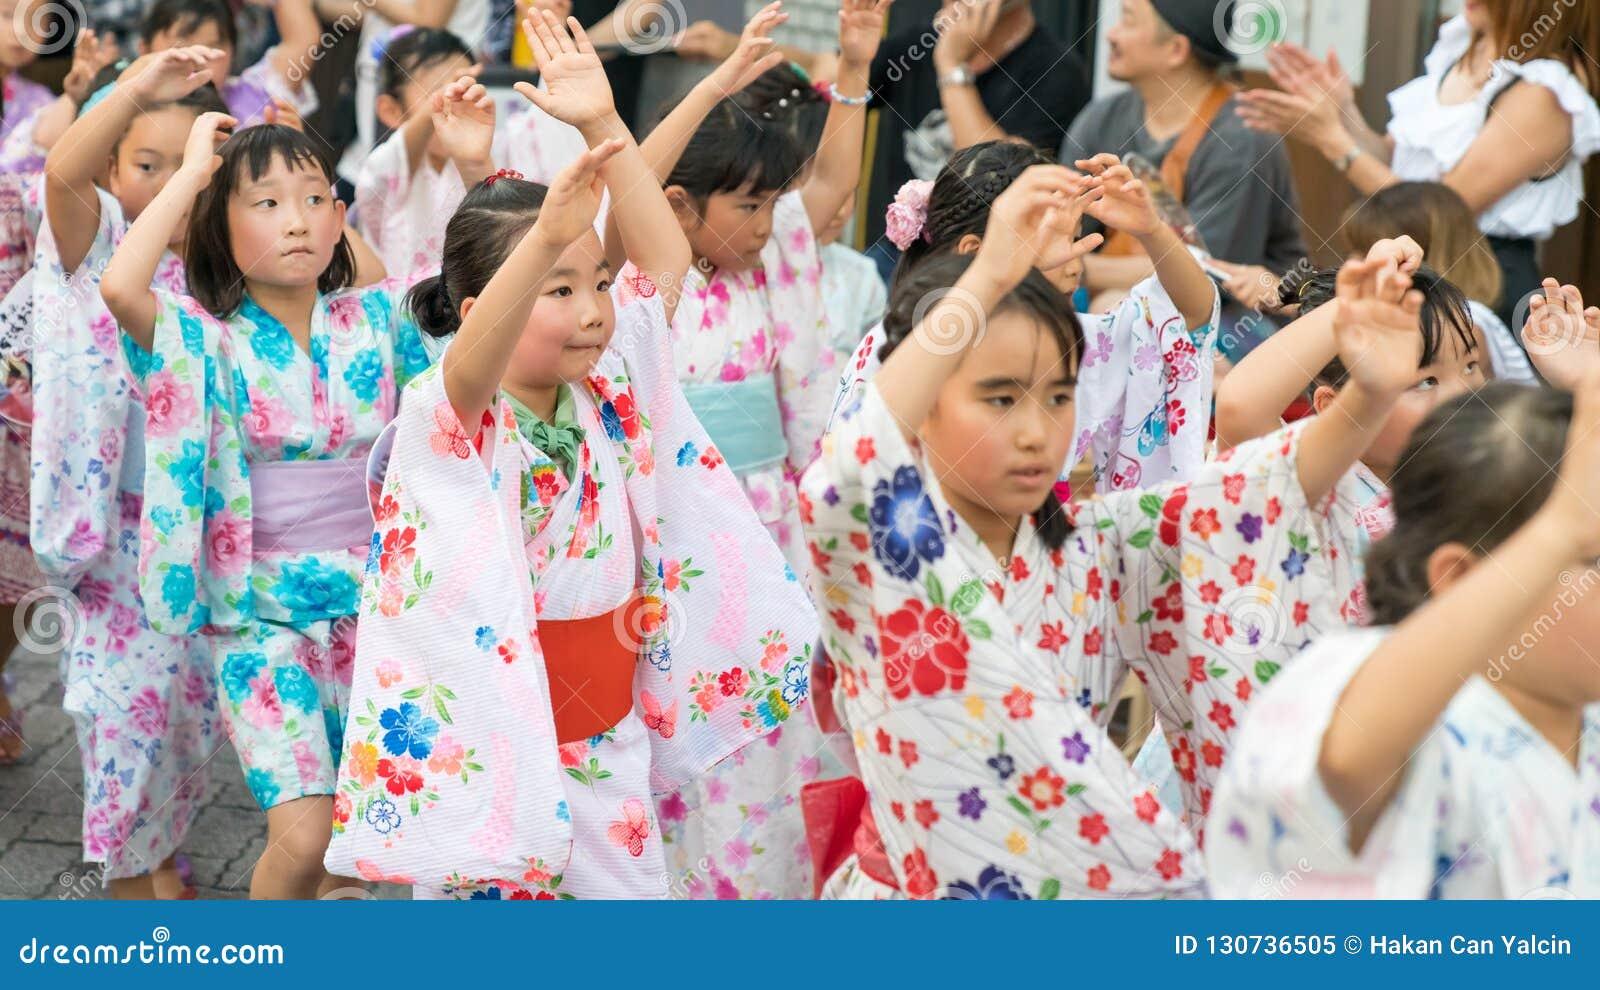 Japanese children dancing traditional Awaodori dance in the famous Koenji Awa Odori festival, Tokyo, Japan